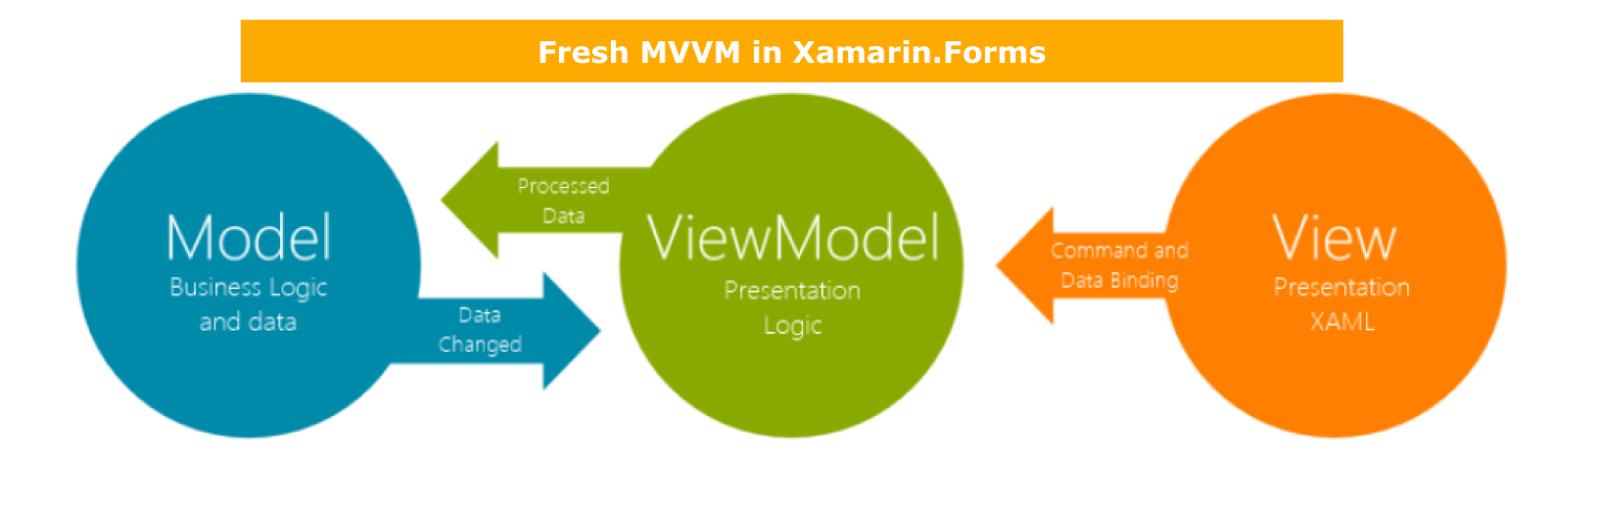 getting started with xamarin forms freshmvvm framework c xaml